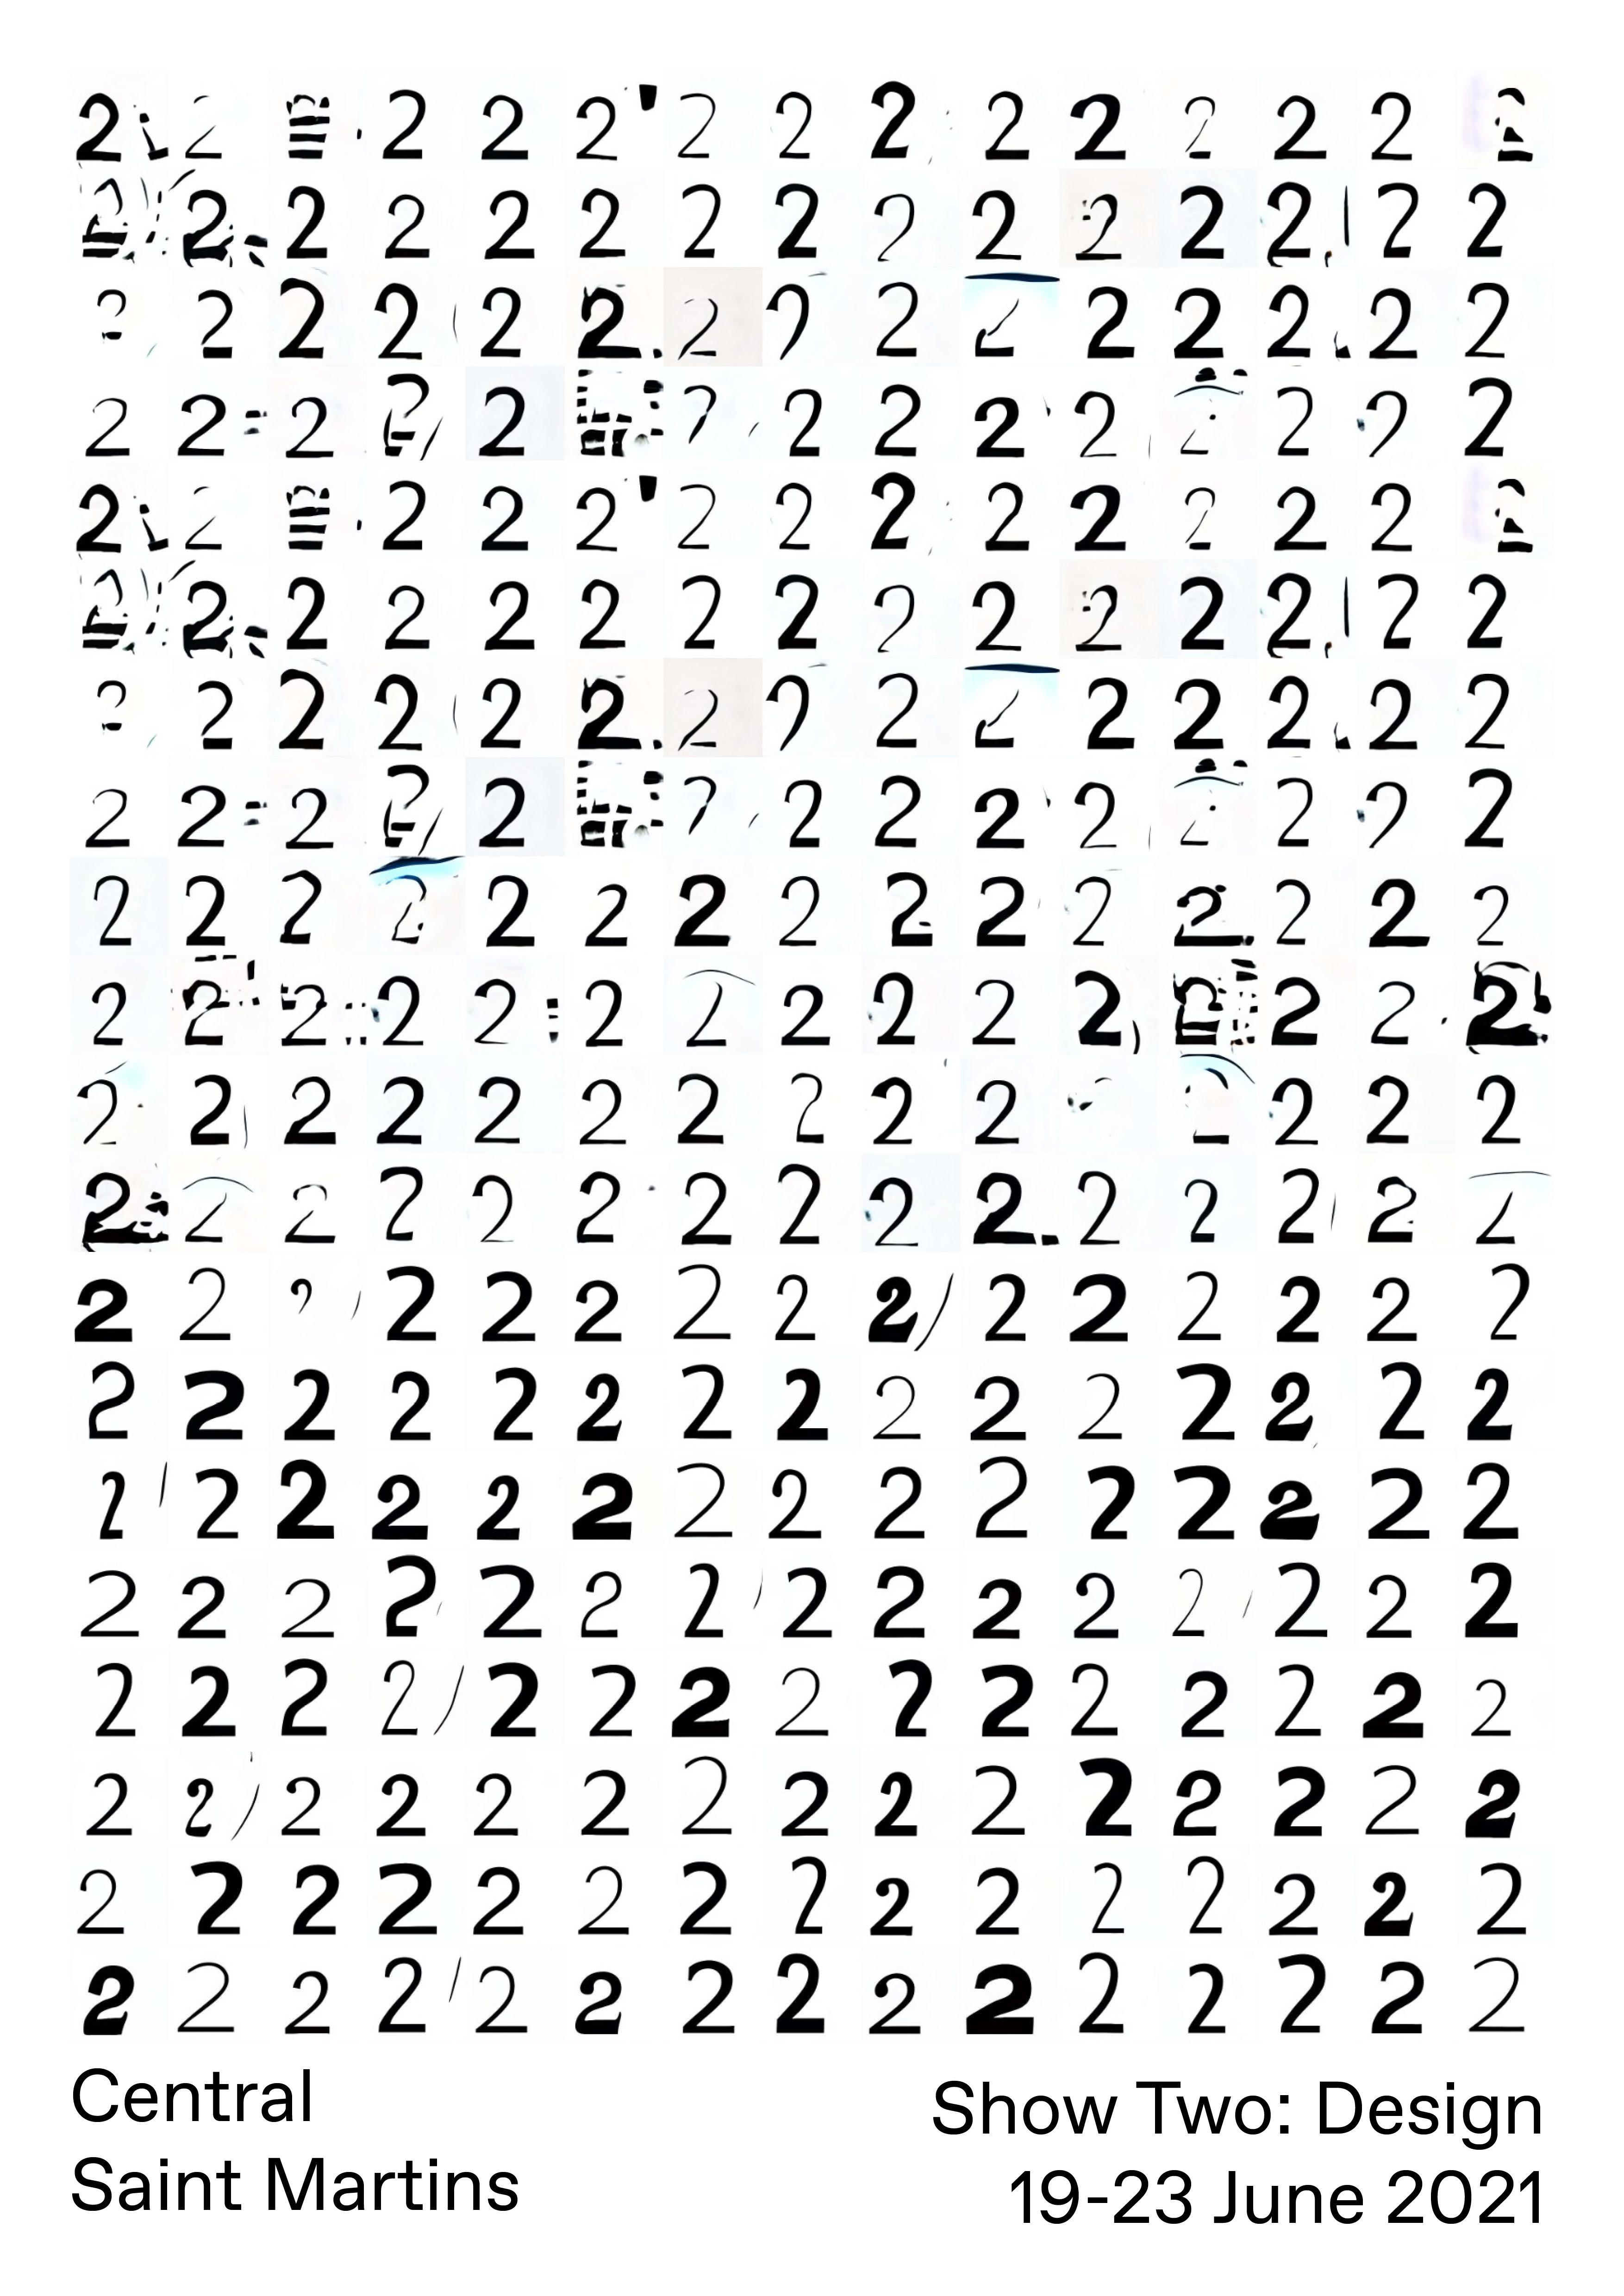 2021_18_01_A3_Grid8.png